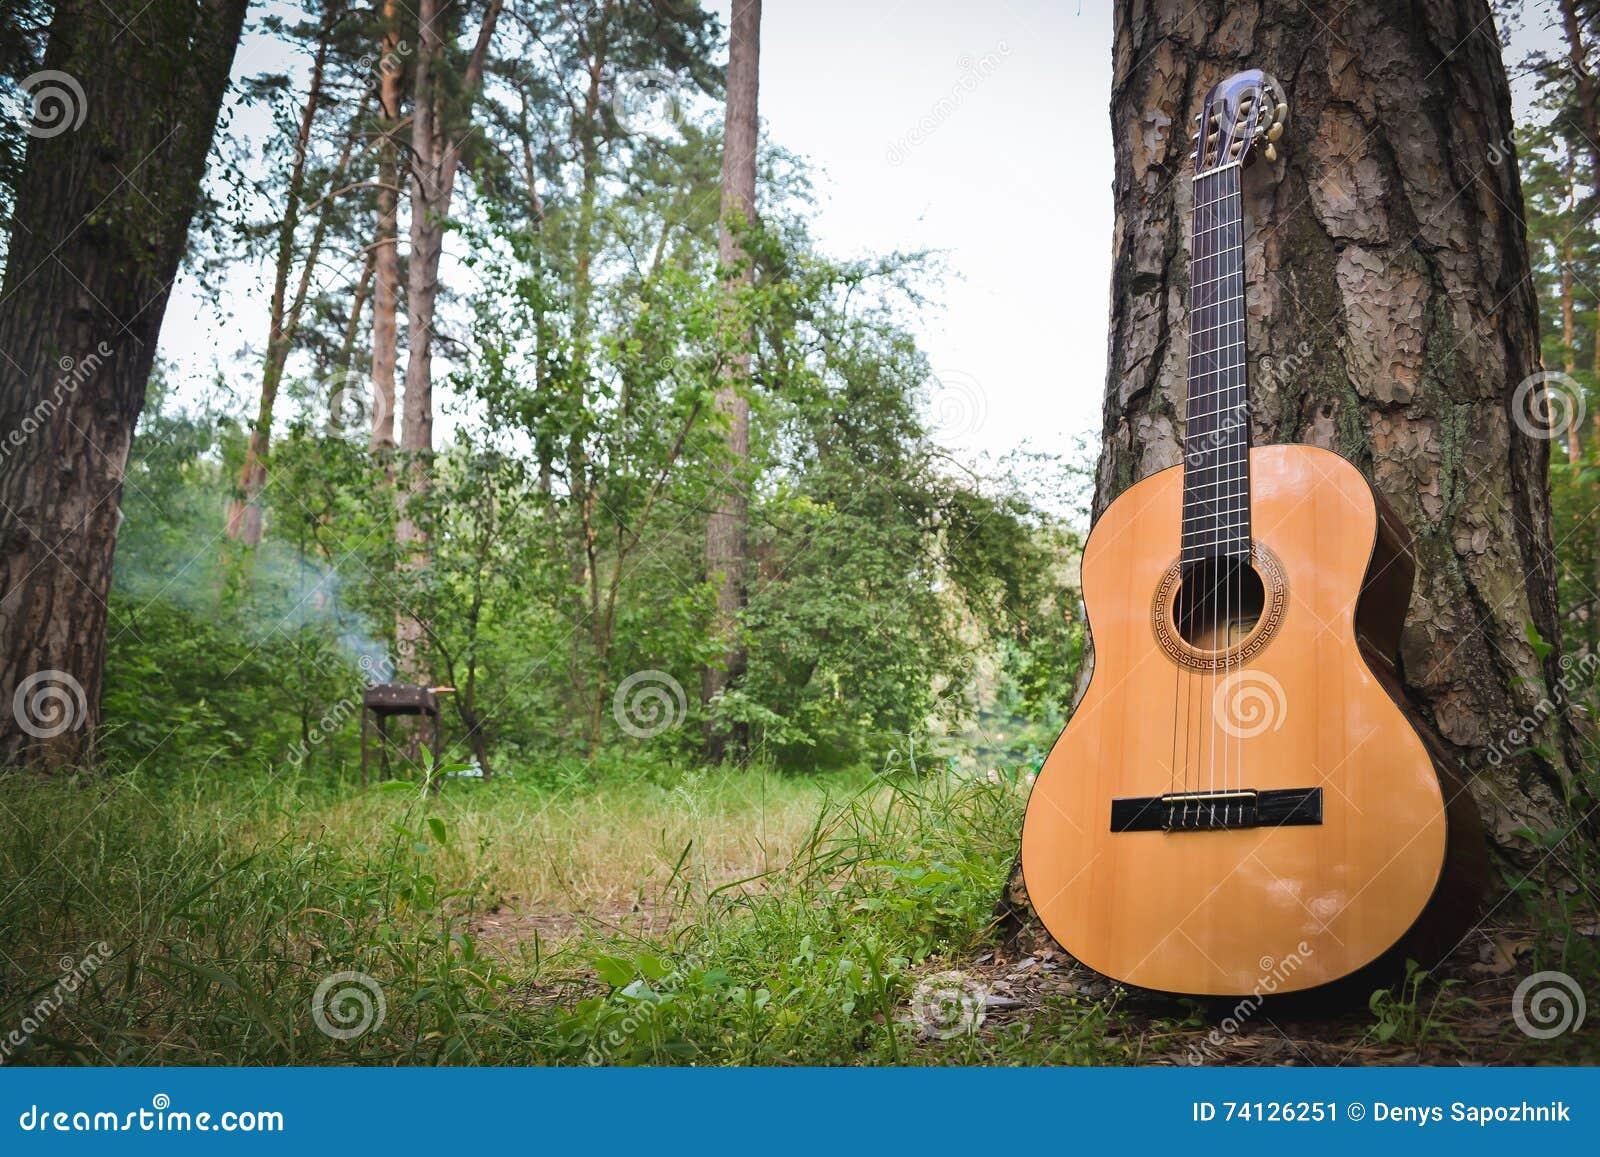 Gitara blisko drzewa w lesie na tle grill